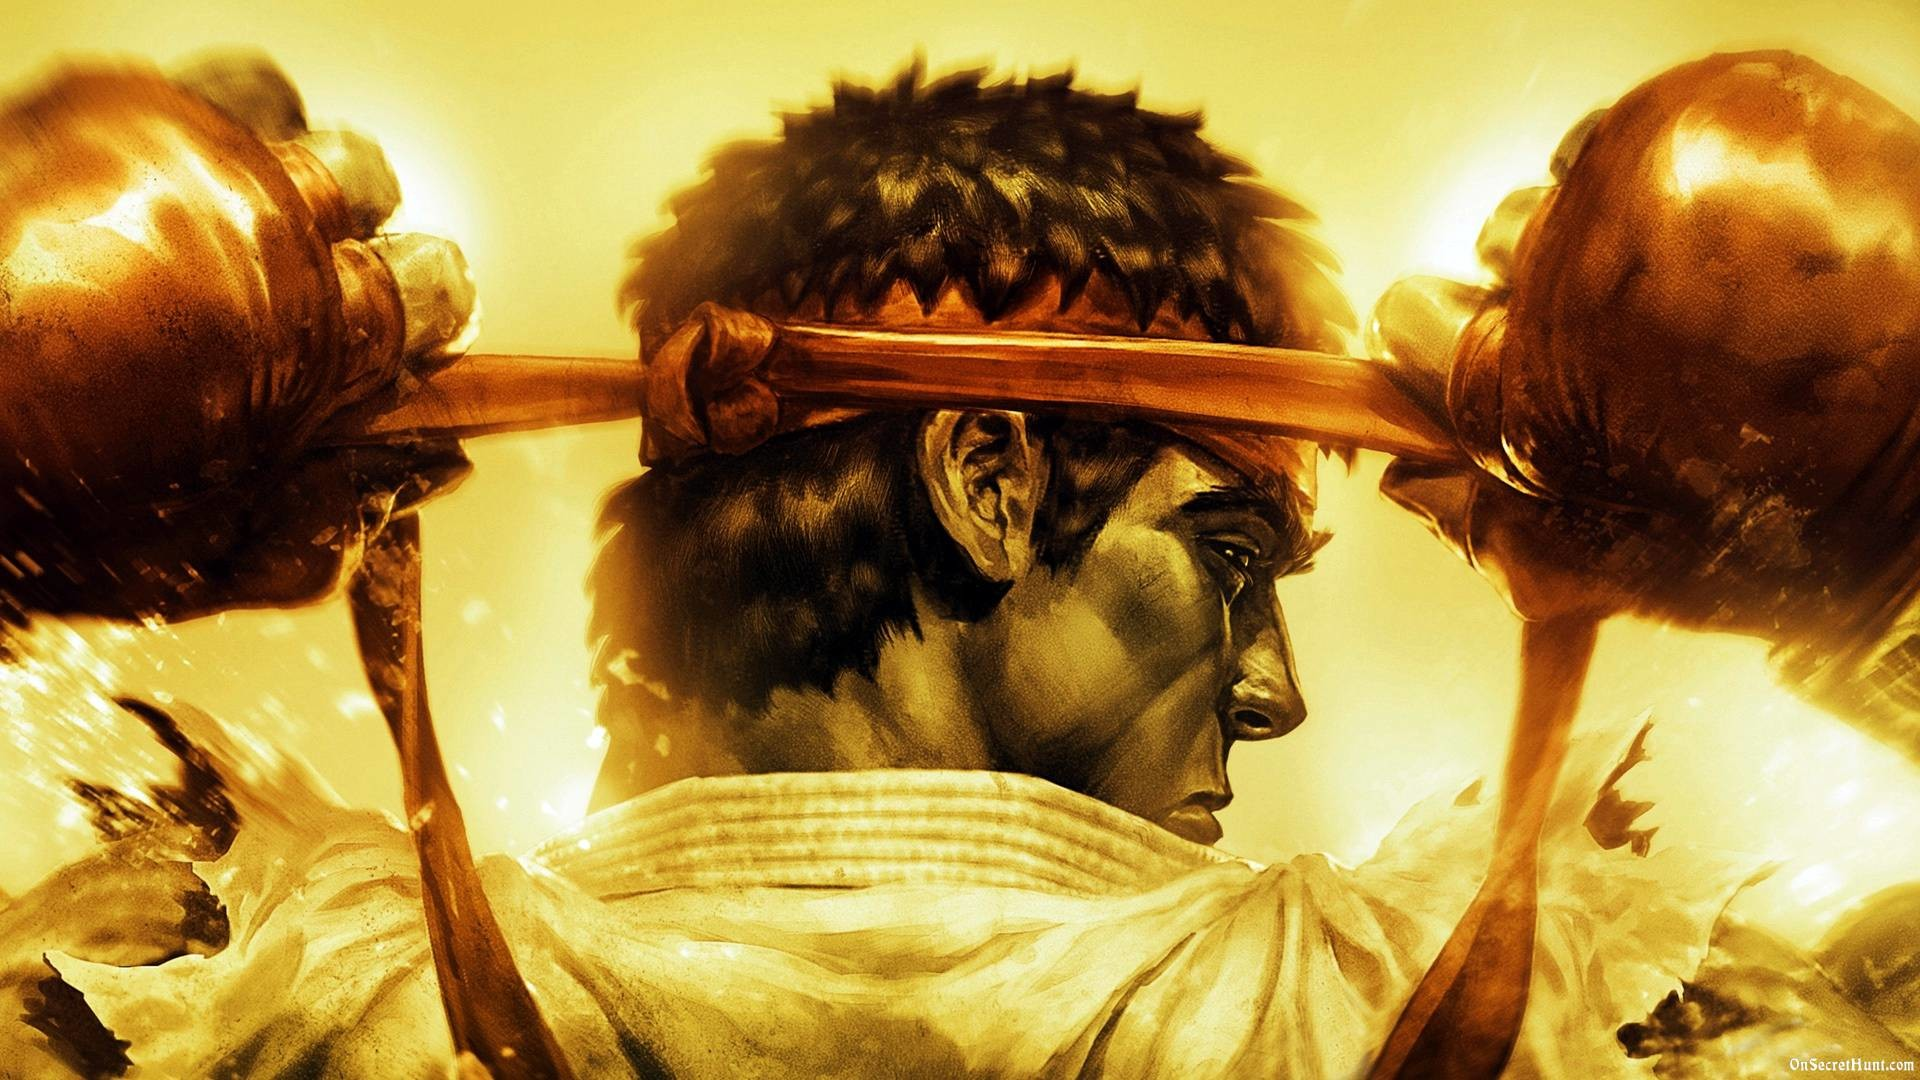 Image – Street-fighter-ryu-wallpaper-ryu-wallpaper-street-